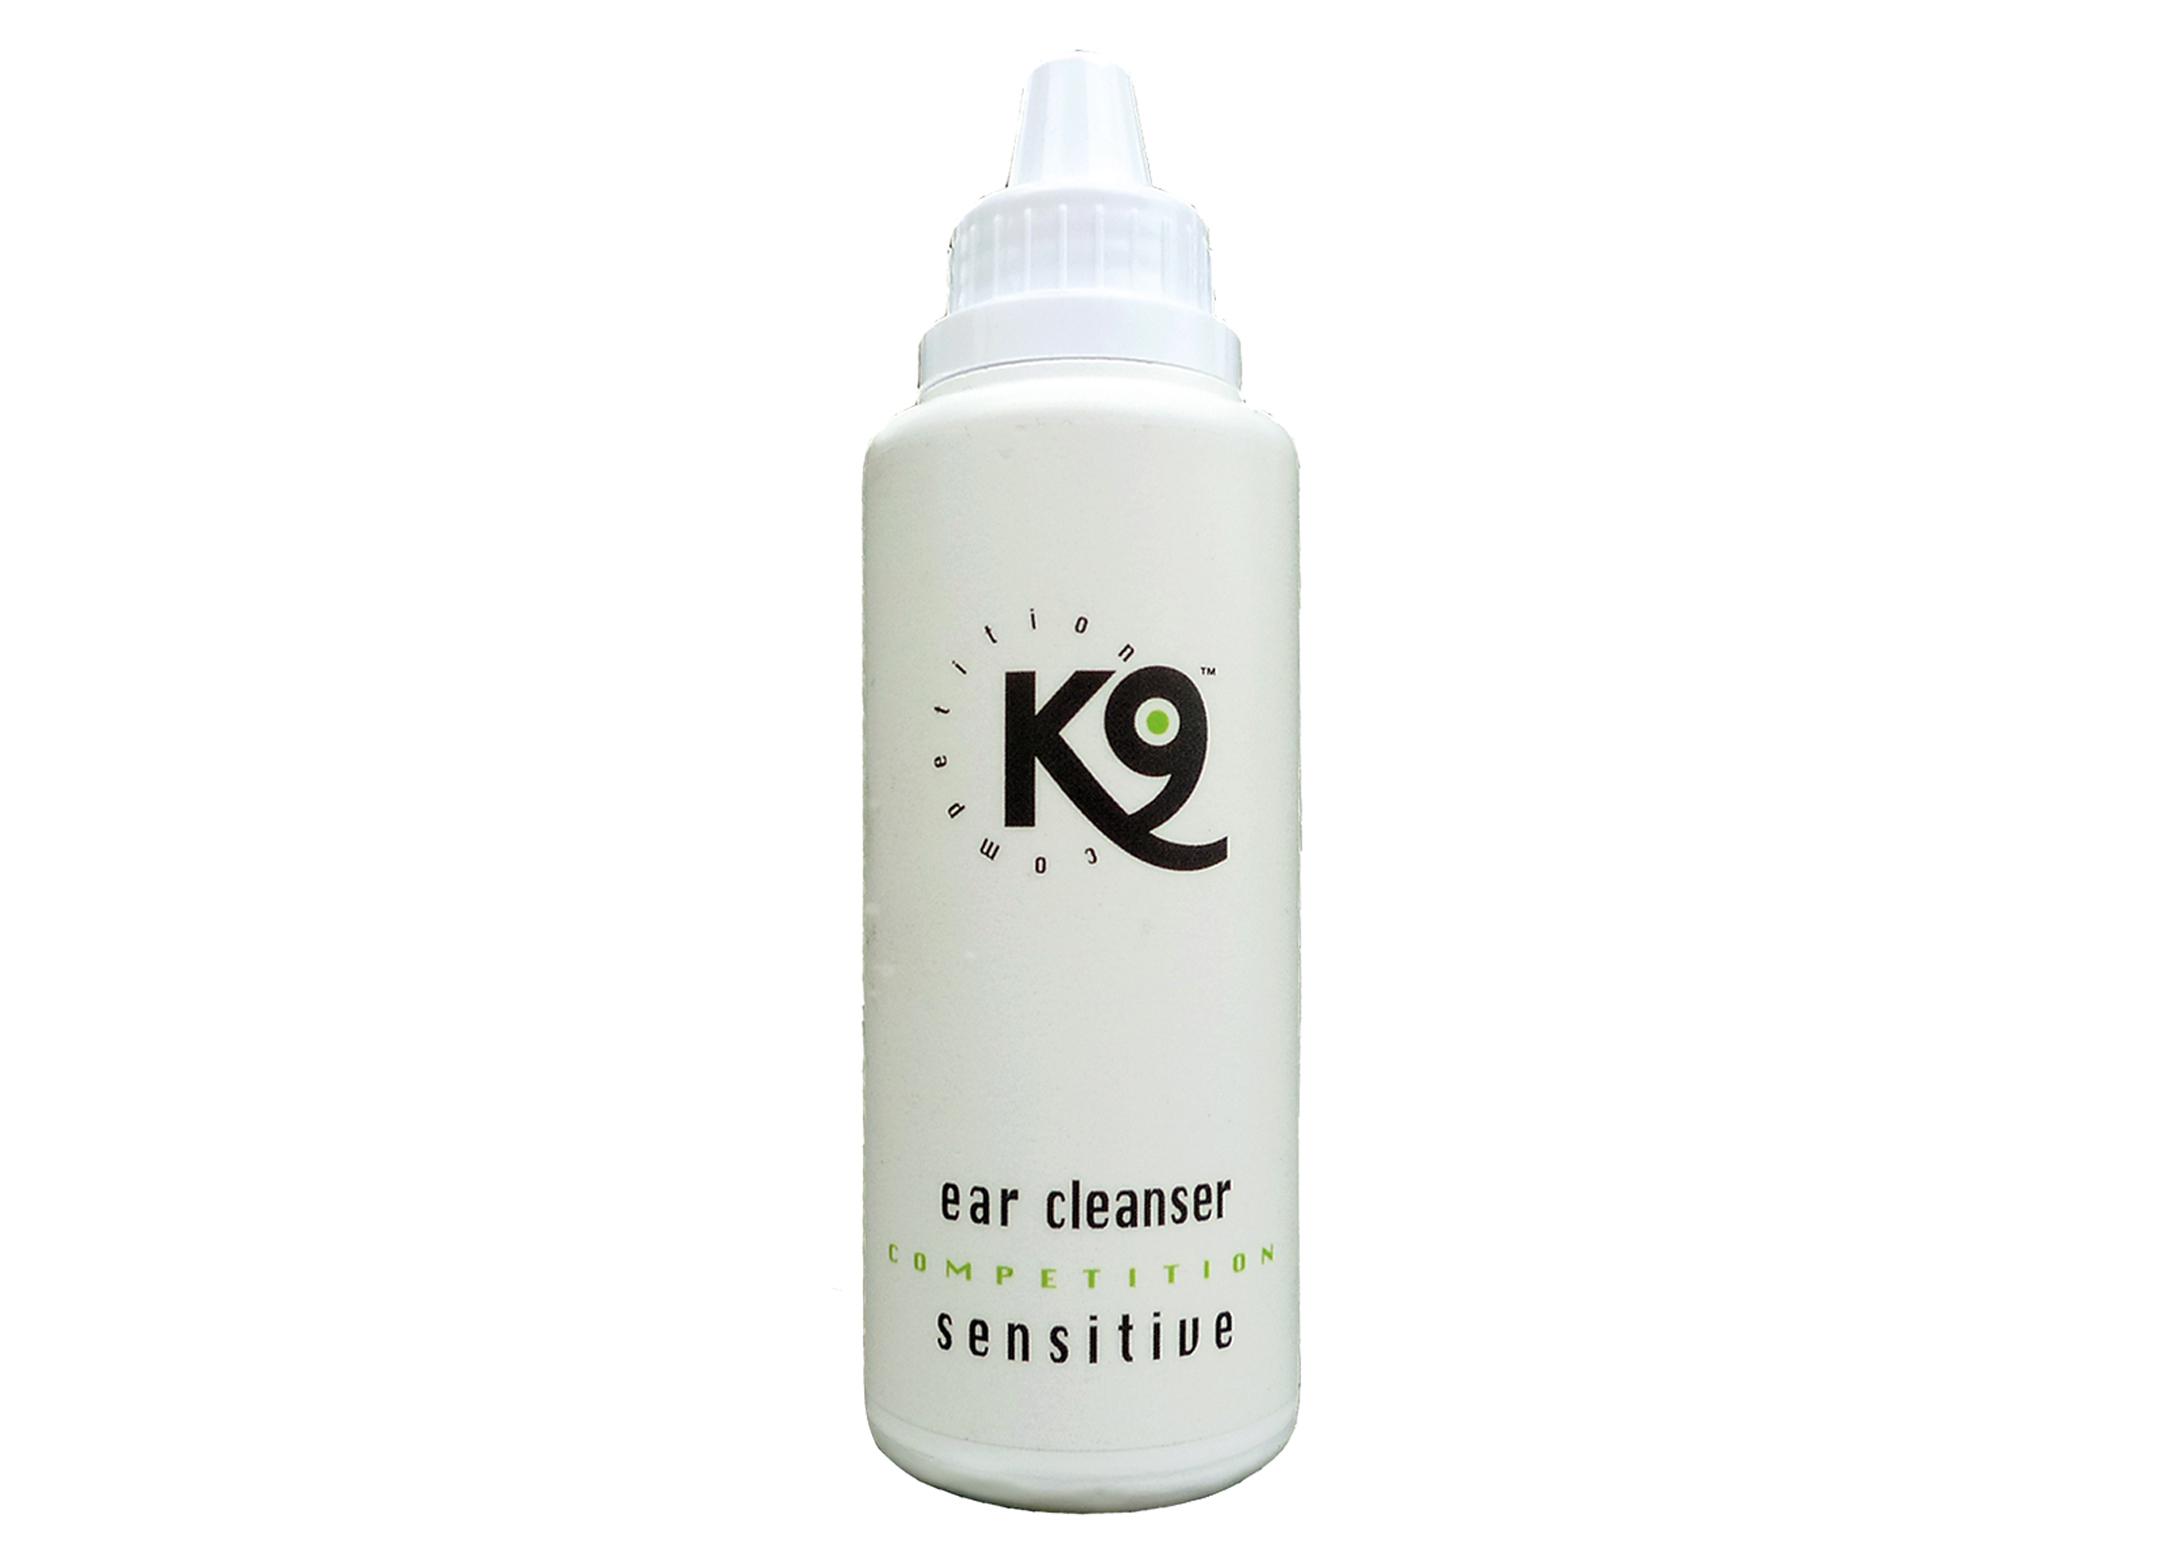 K9 Ear Cleaner Sensible 150 ml Nettoyant-Oreilles